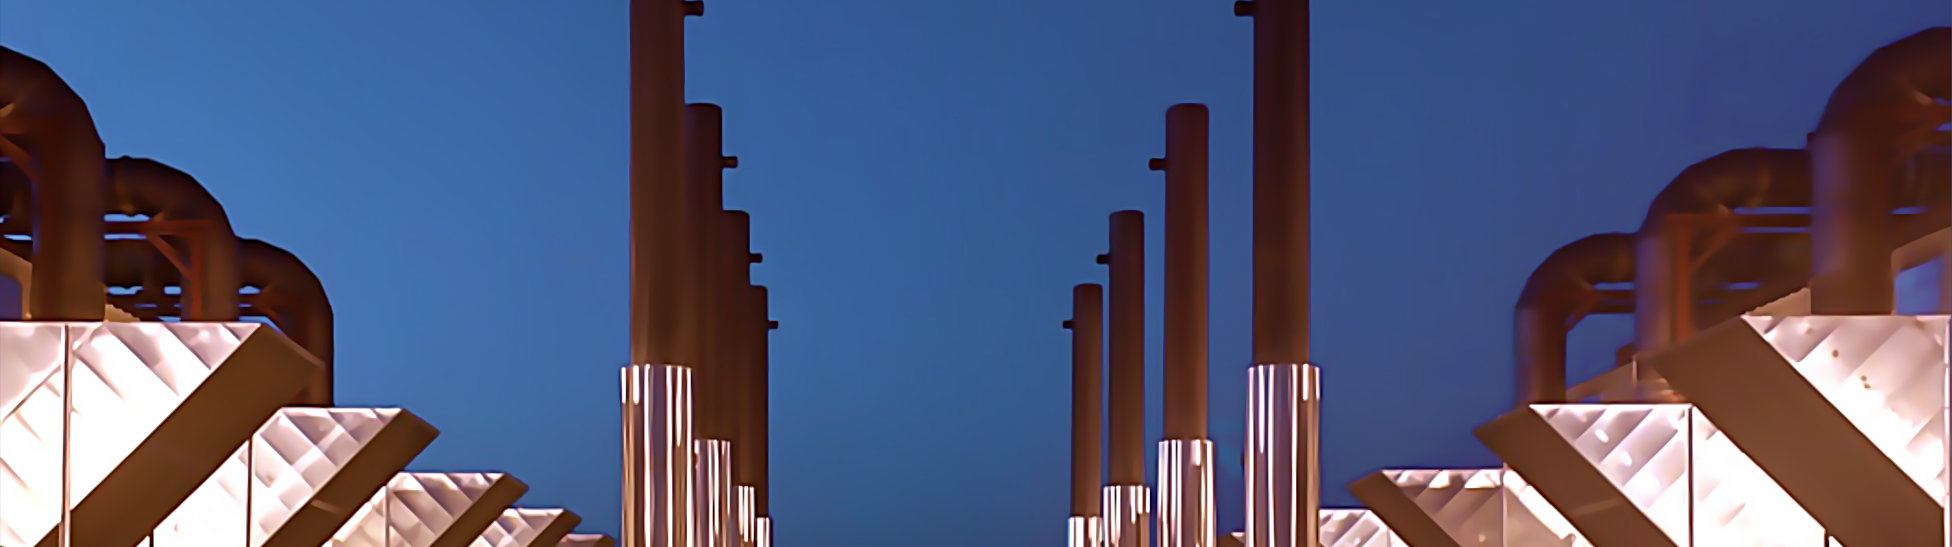 Dezentrale Kraftwerksanlagen